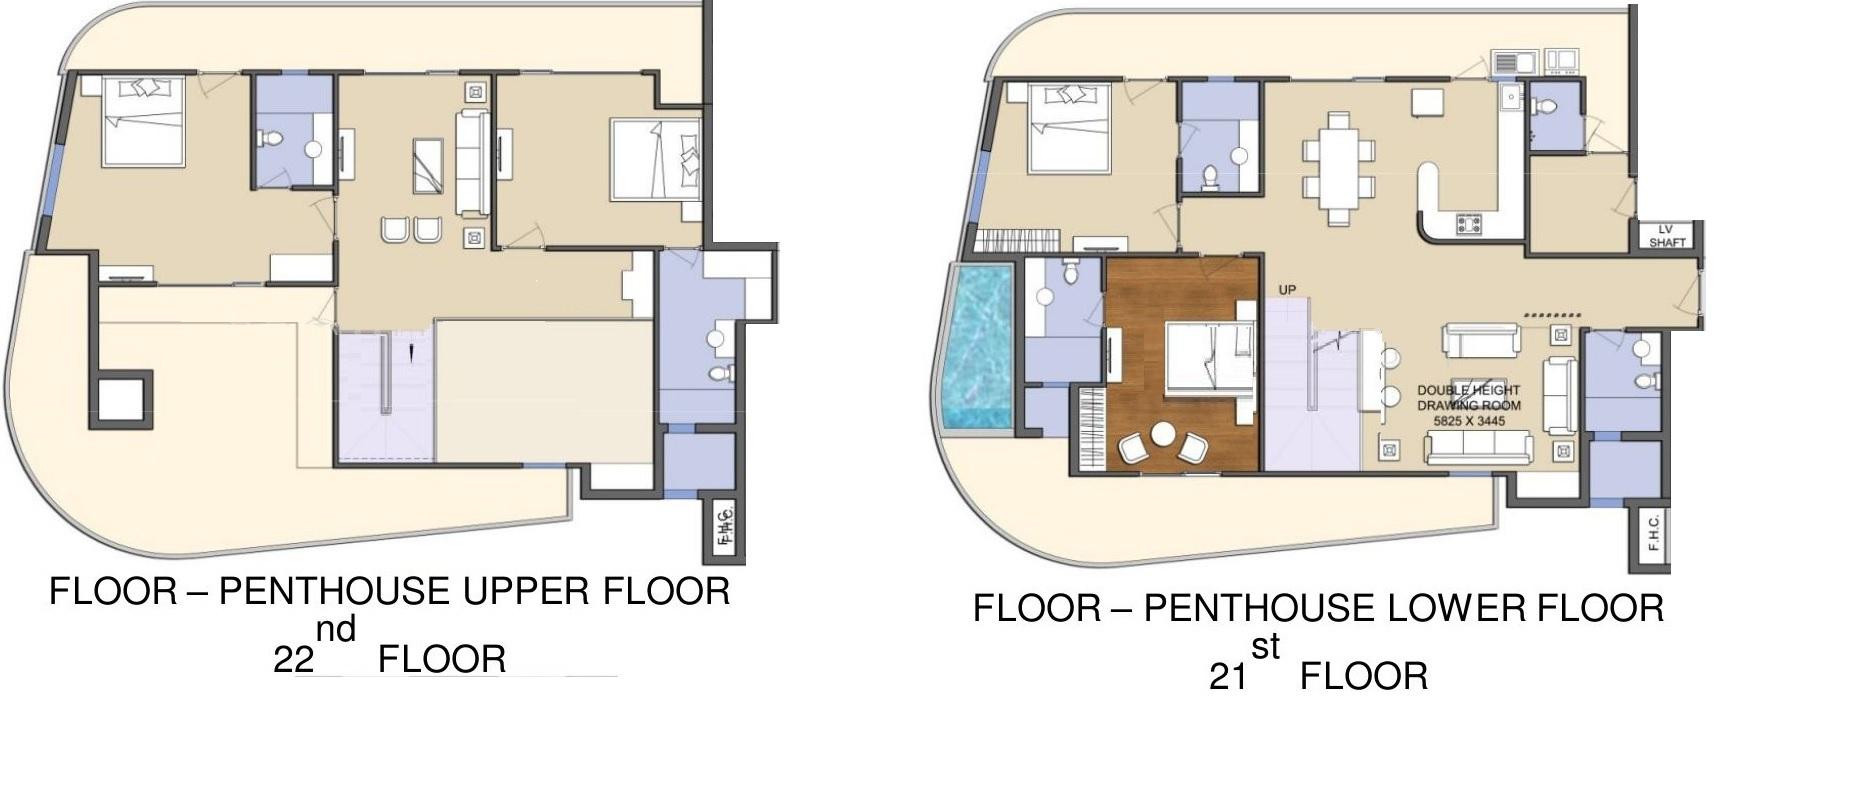 solitairian city turbo penthouse 4 bhk 3990sqft 20200323140353